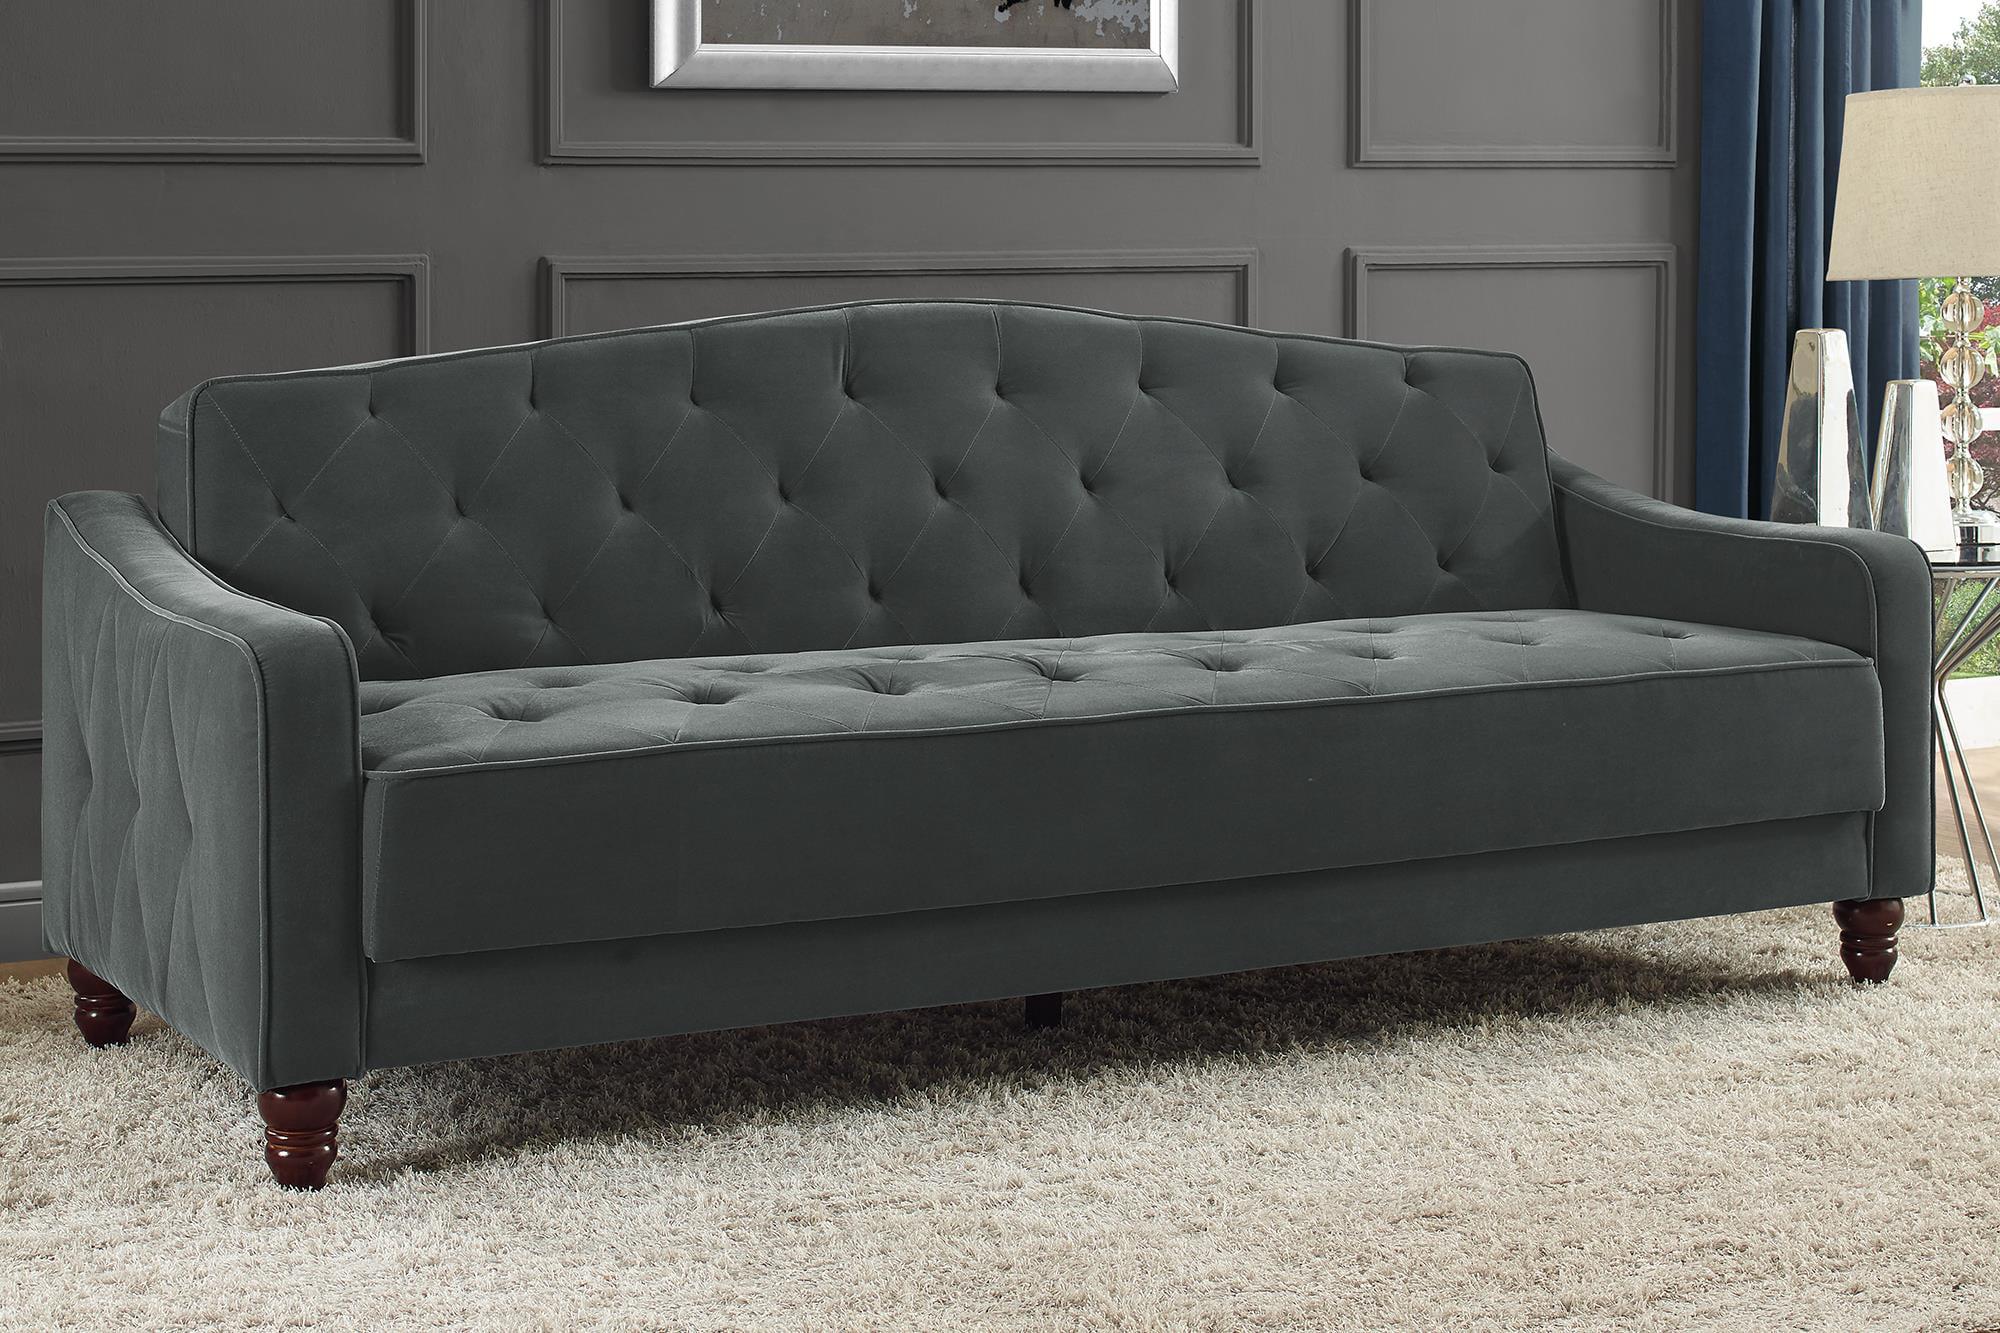 novogratz vintage tufted sofa sleeper ii multiple colors grey velour walmart com